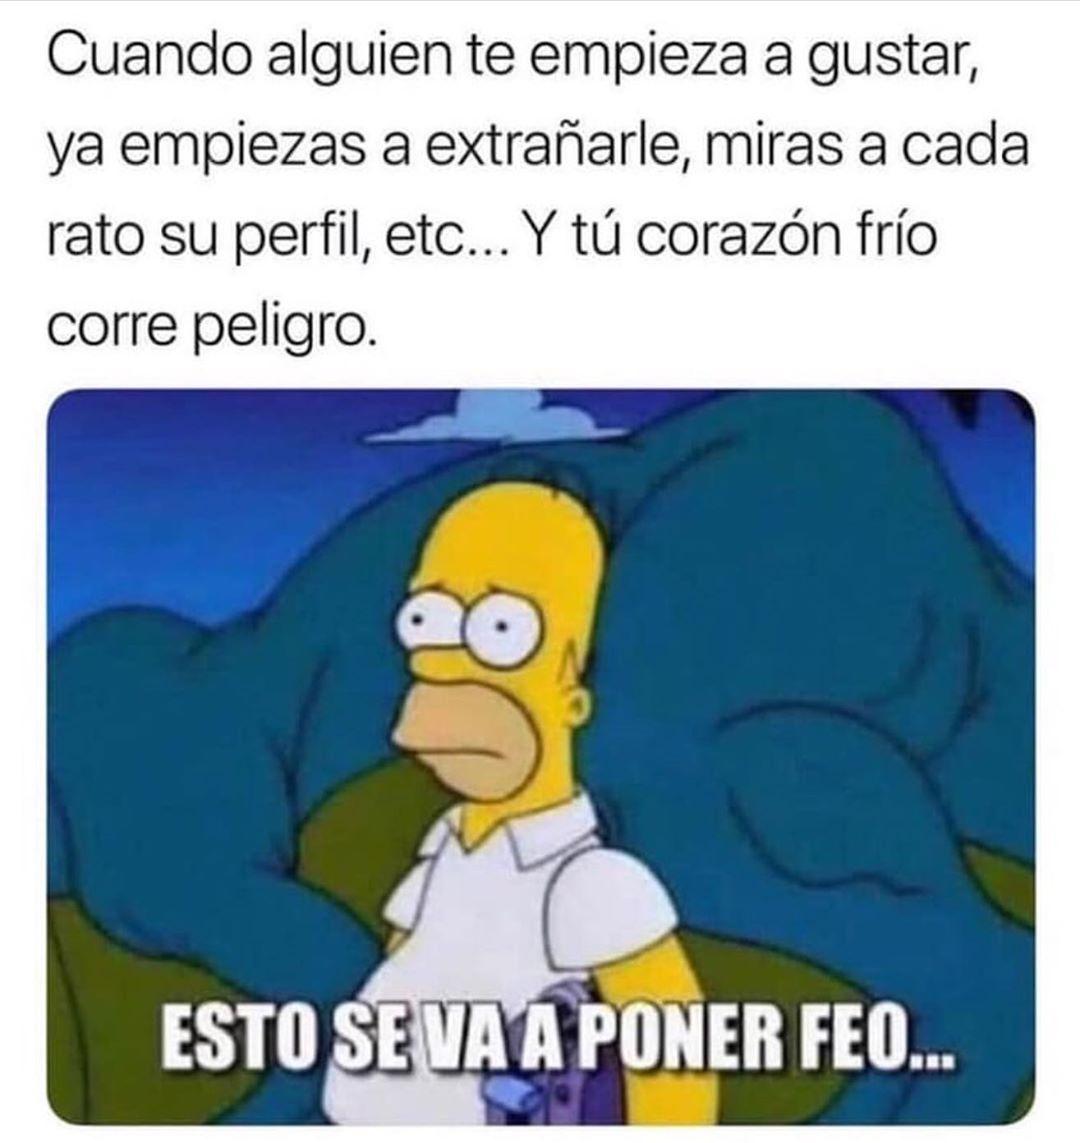 Etiqueta A Tus Amigos Sigueme Para Ver Mas Memes Eldinosaurio Humor Memes Memes Viral Mexico Ri Funny Memes Memes Best Memes